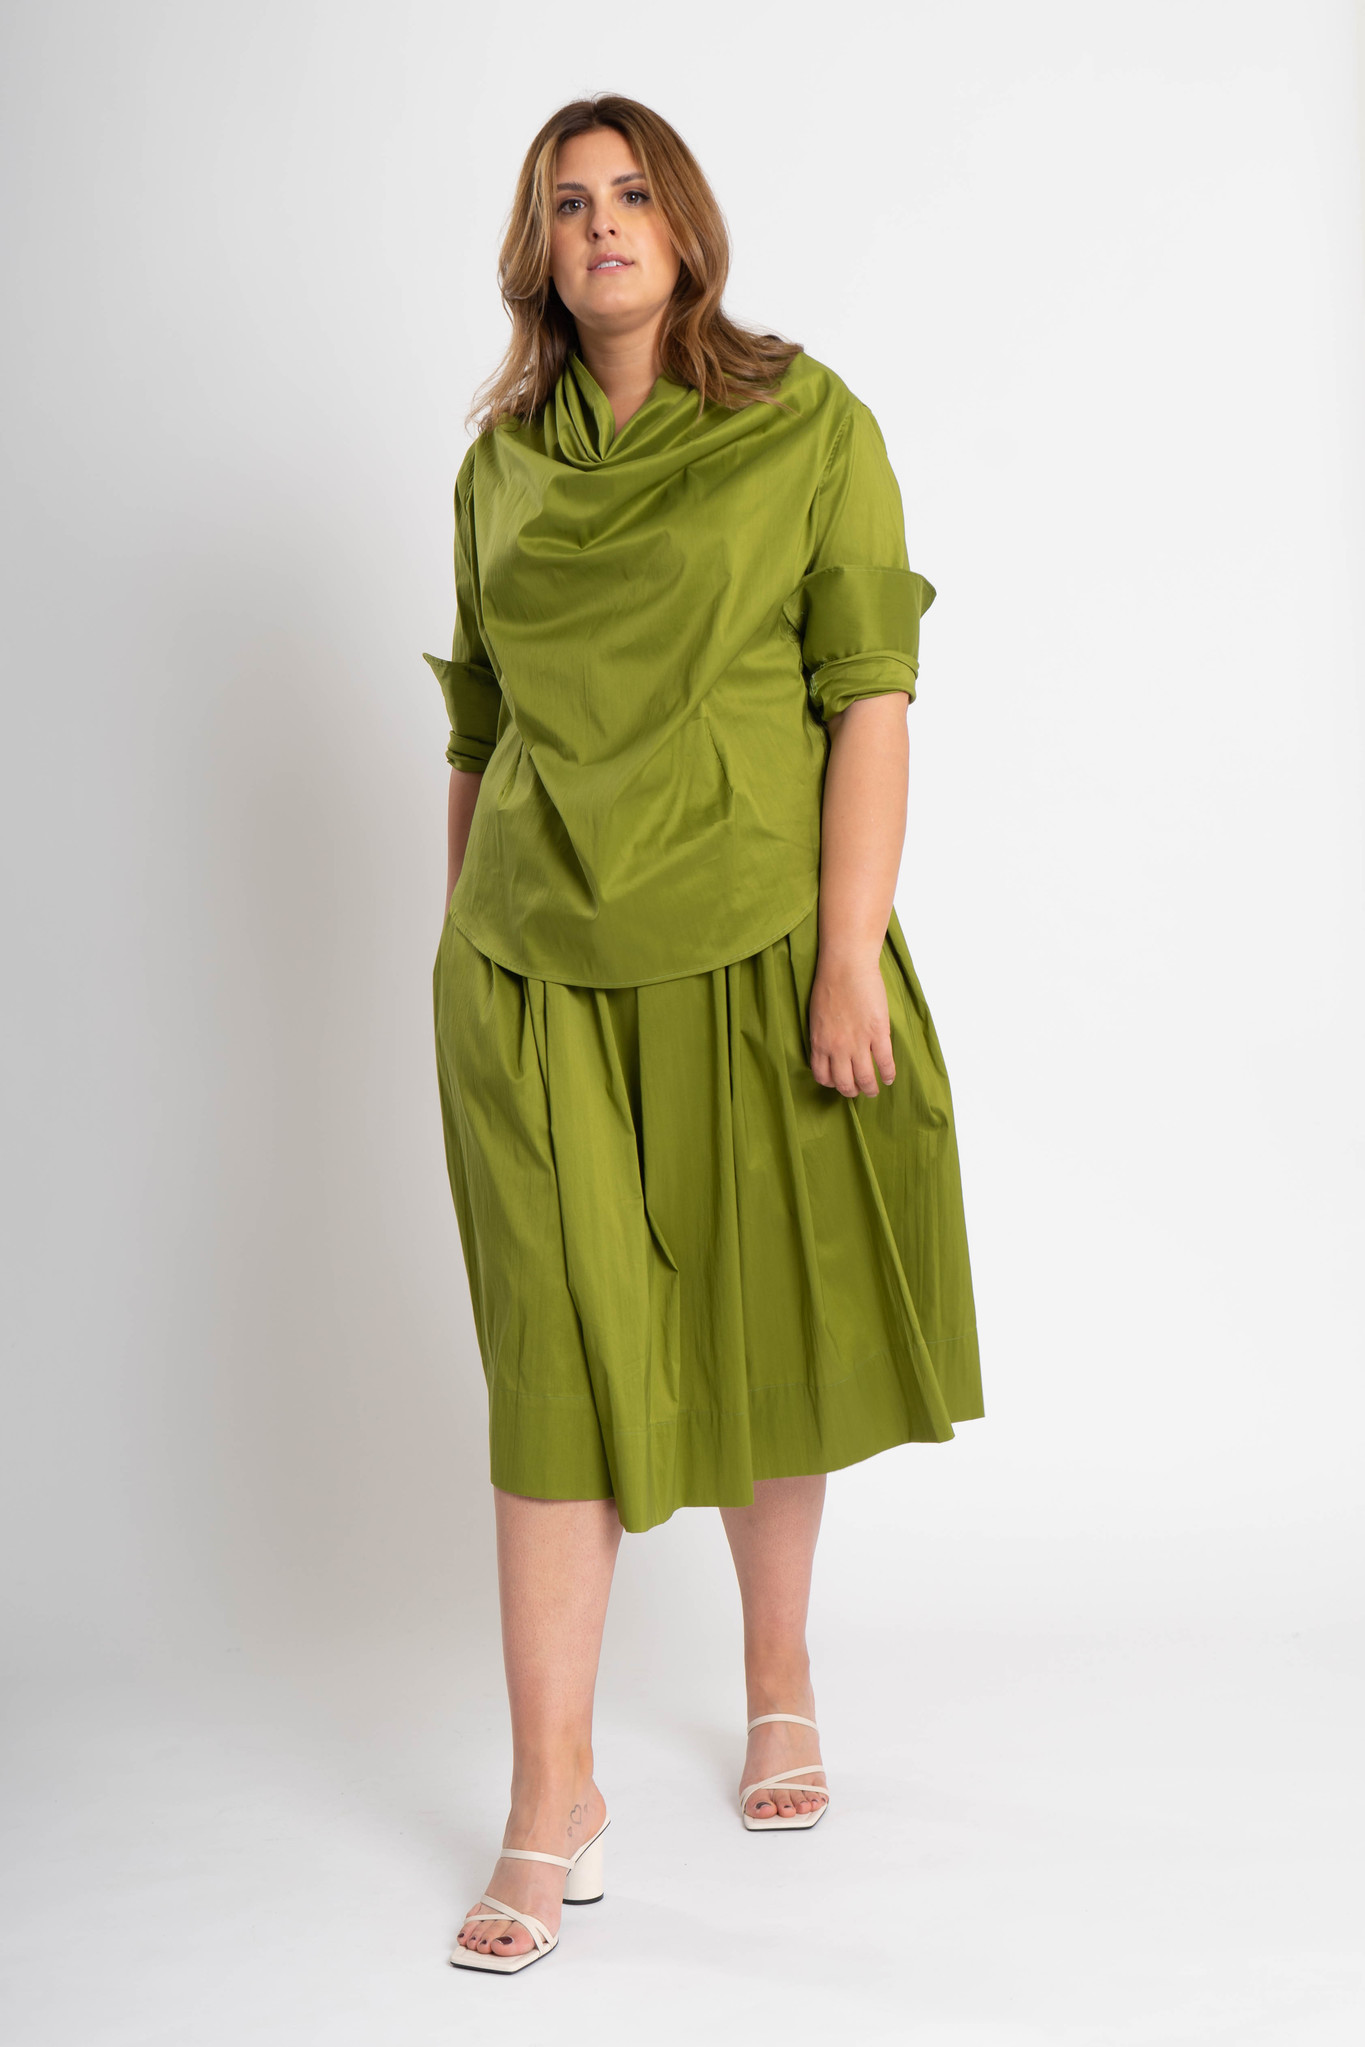 TULIP Skirt in Cotton Popeline stretch-2